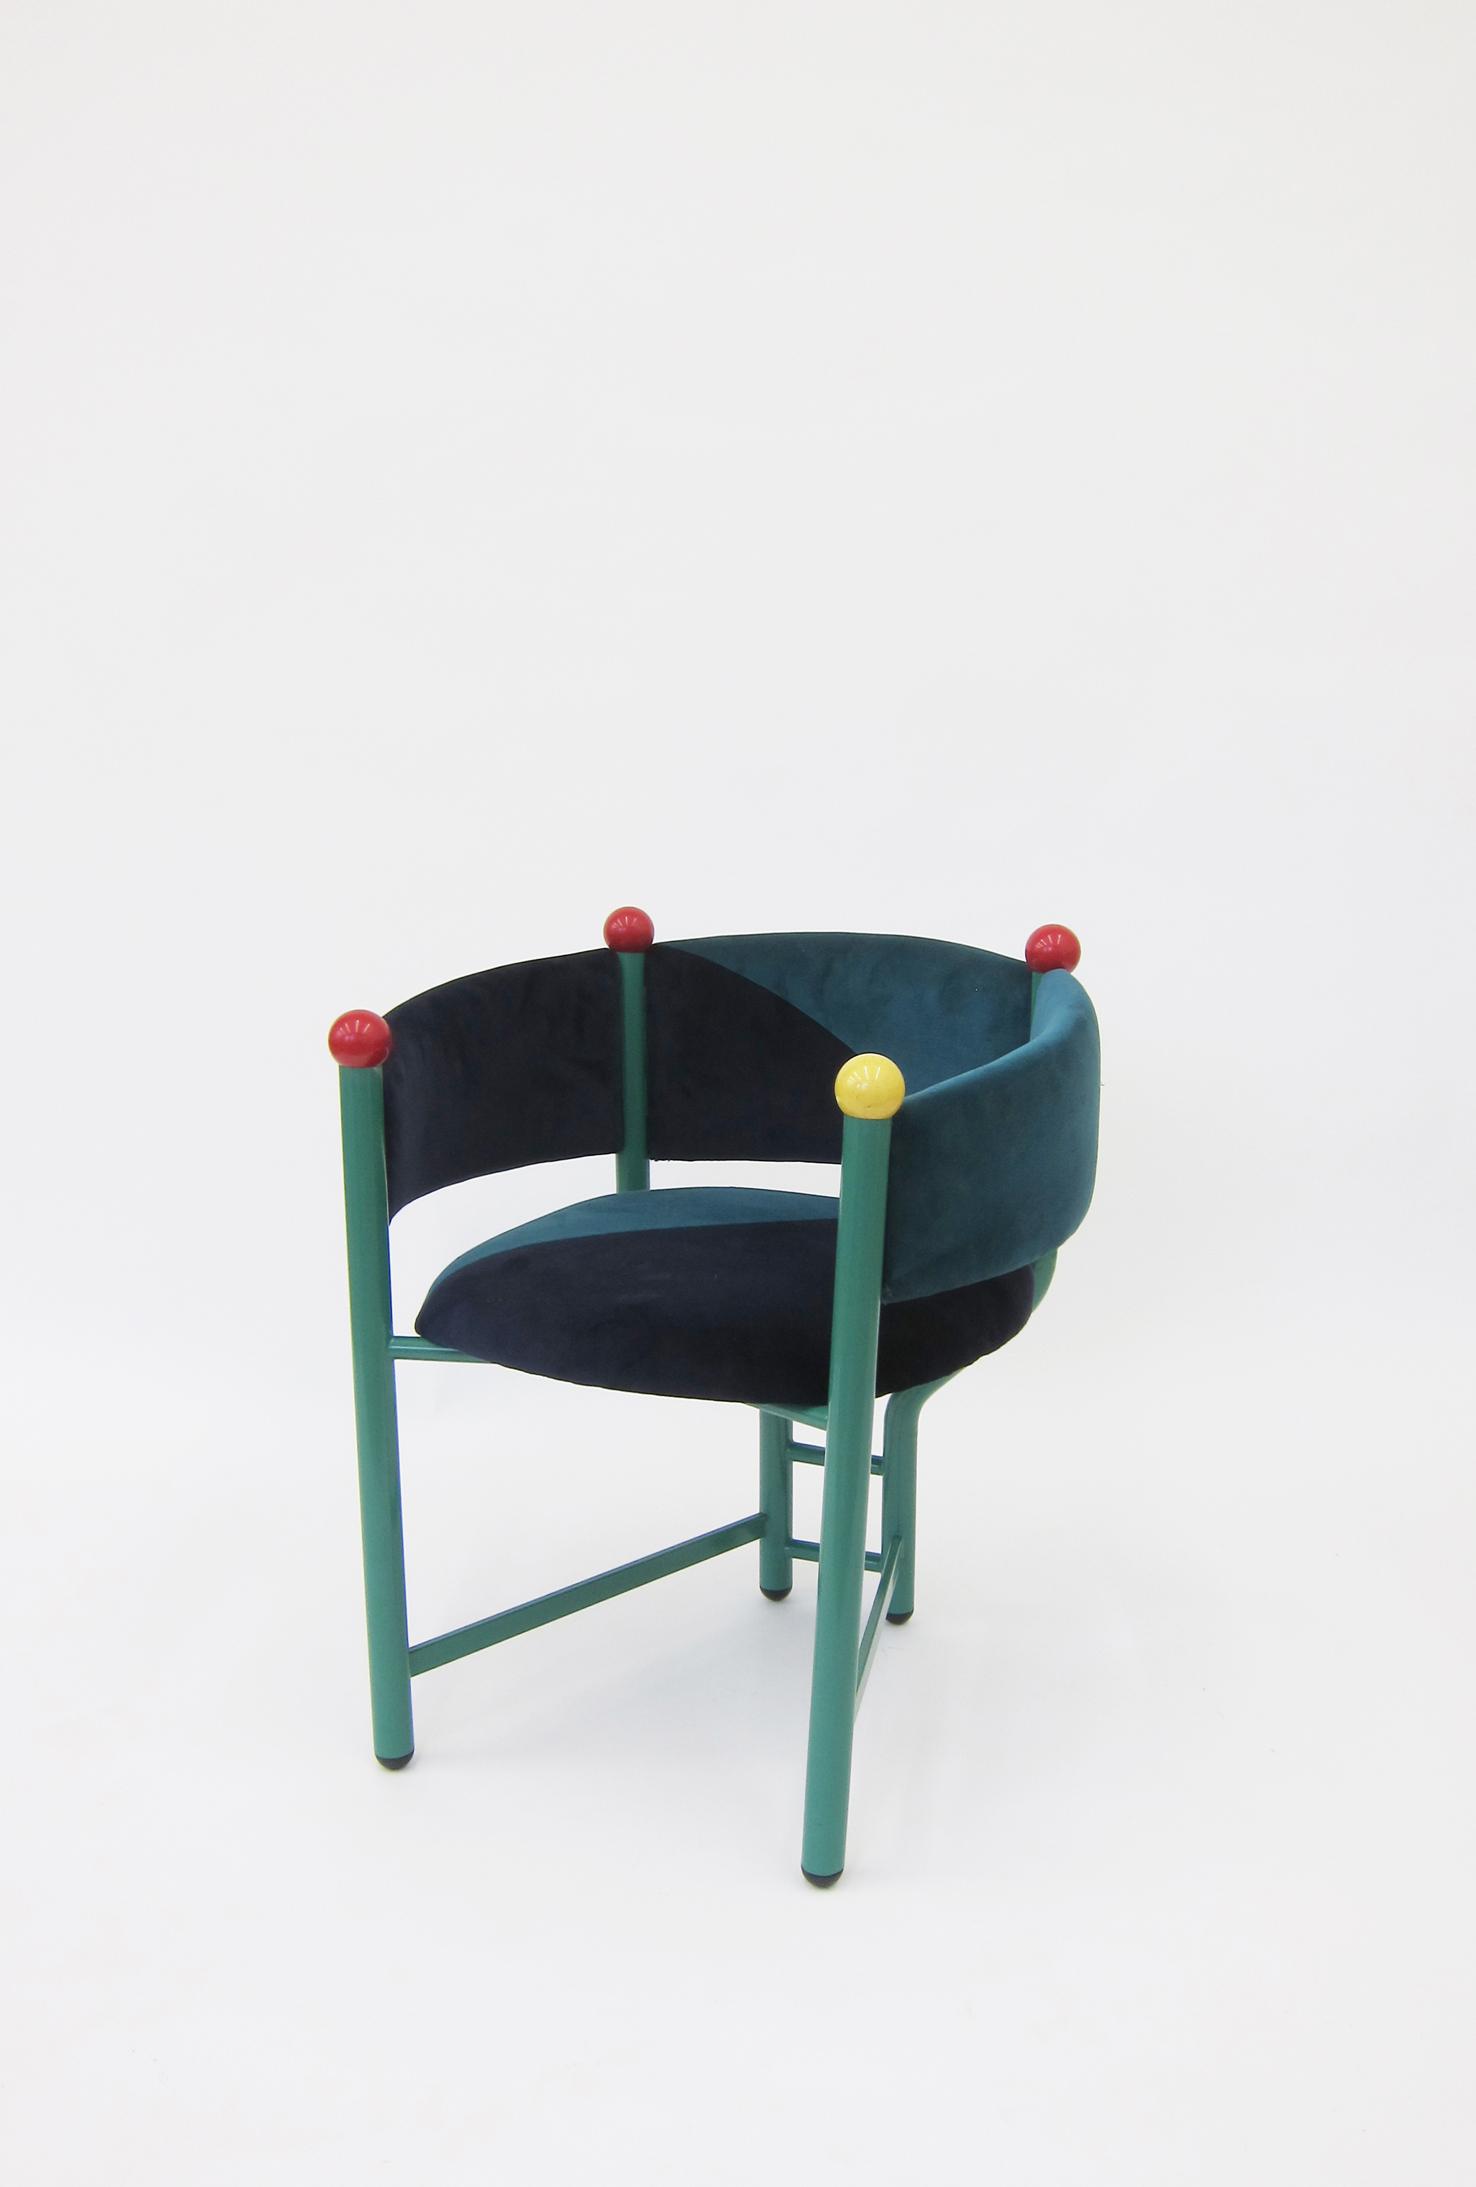 Pagliaccio Chair, metal frame, upholstery, billiard balls, 73 x 63 x 64 cm